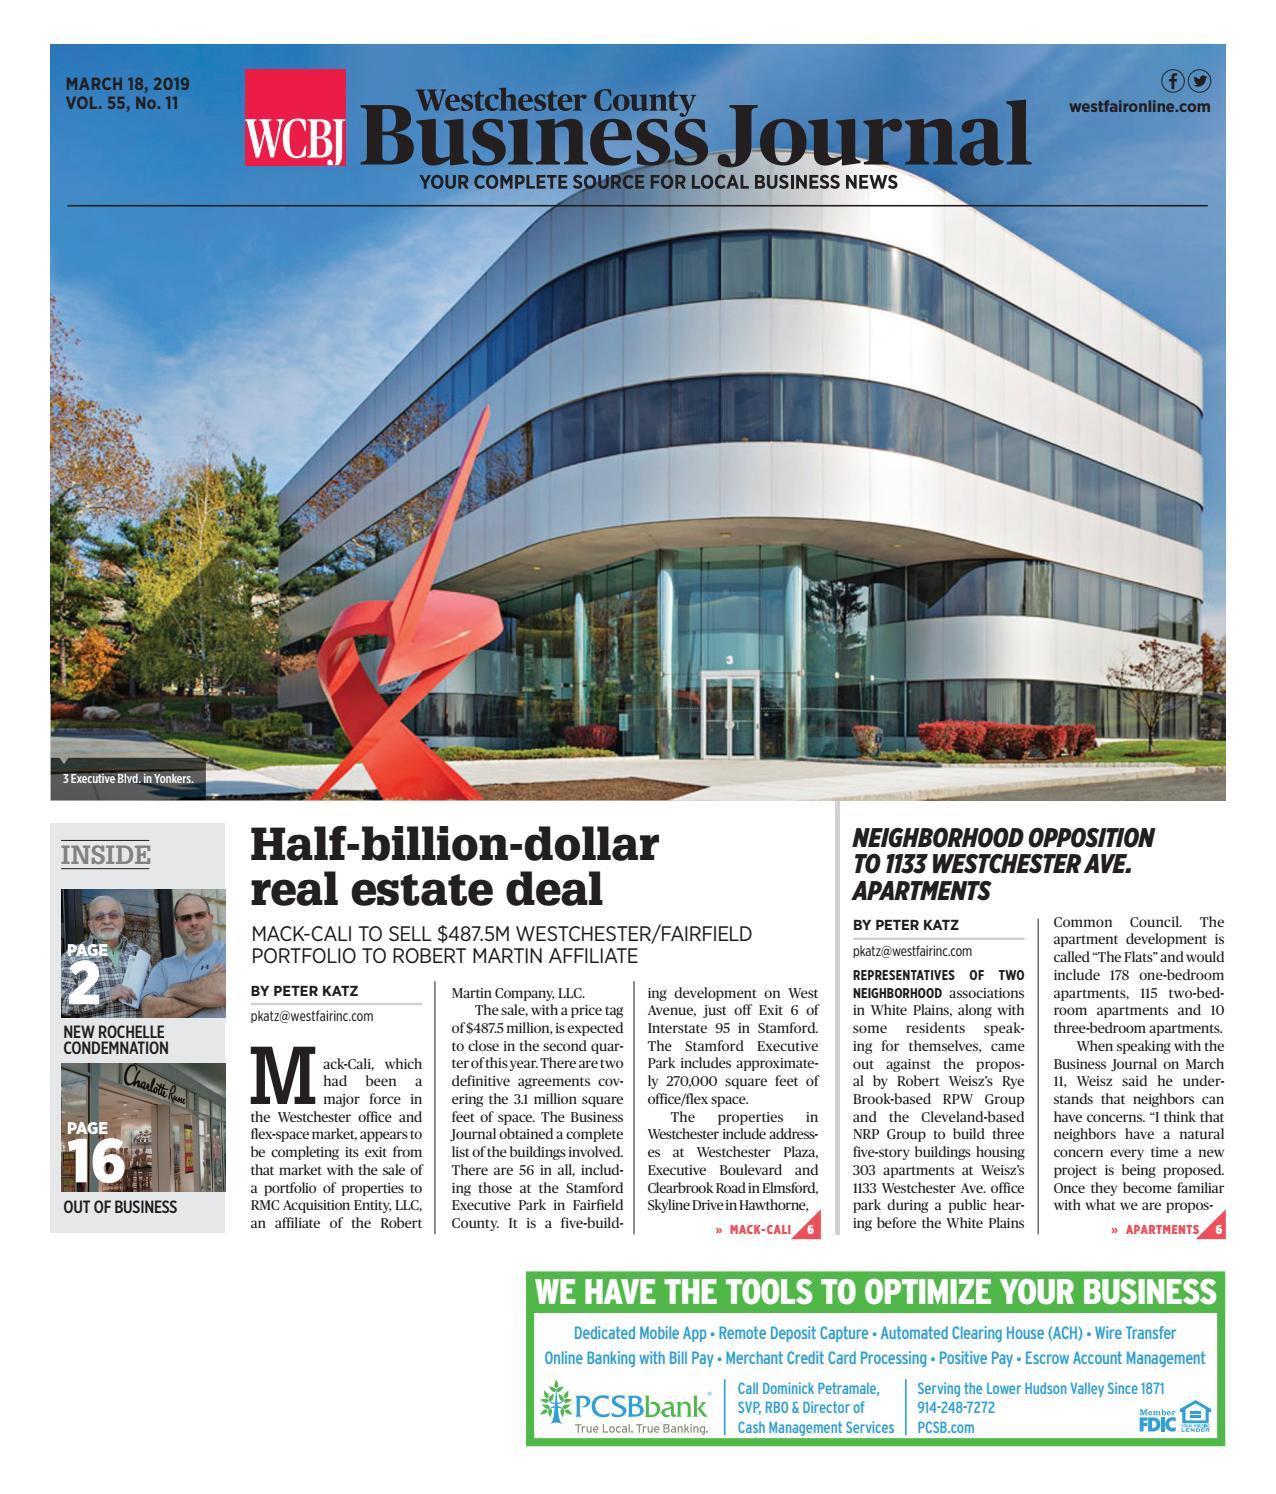 Design Bank 2 Zits Lugo.Westchester County Business Journal 031819 By Wag Magazine Issuu